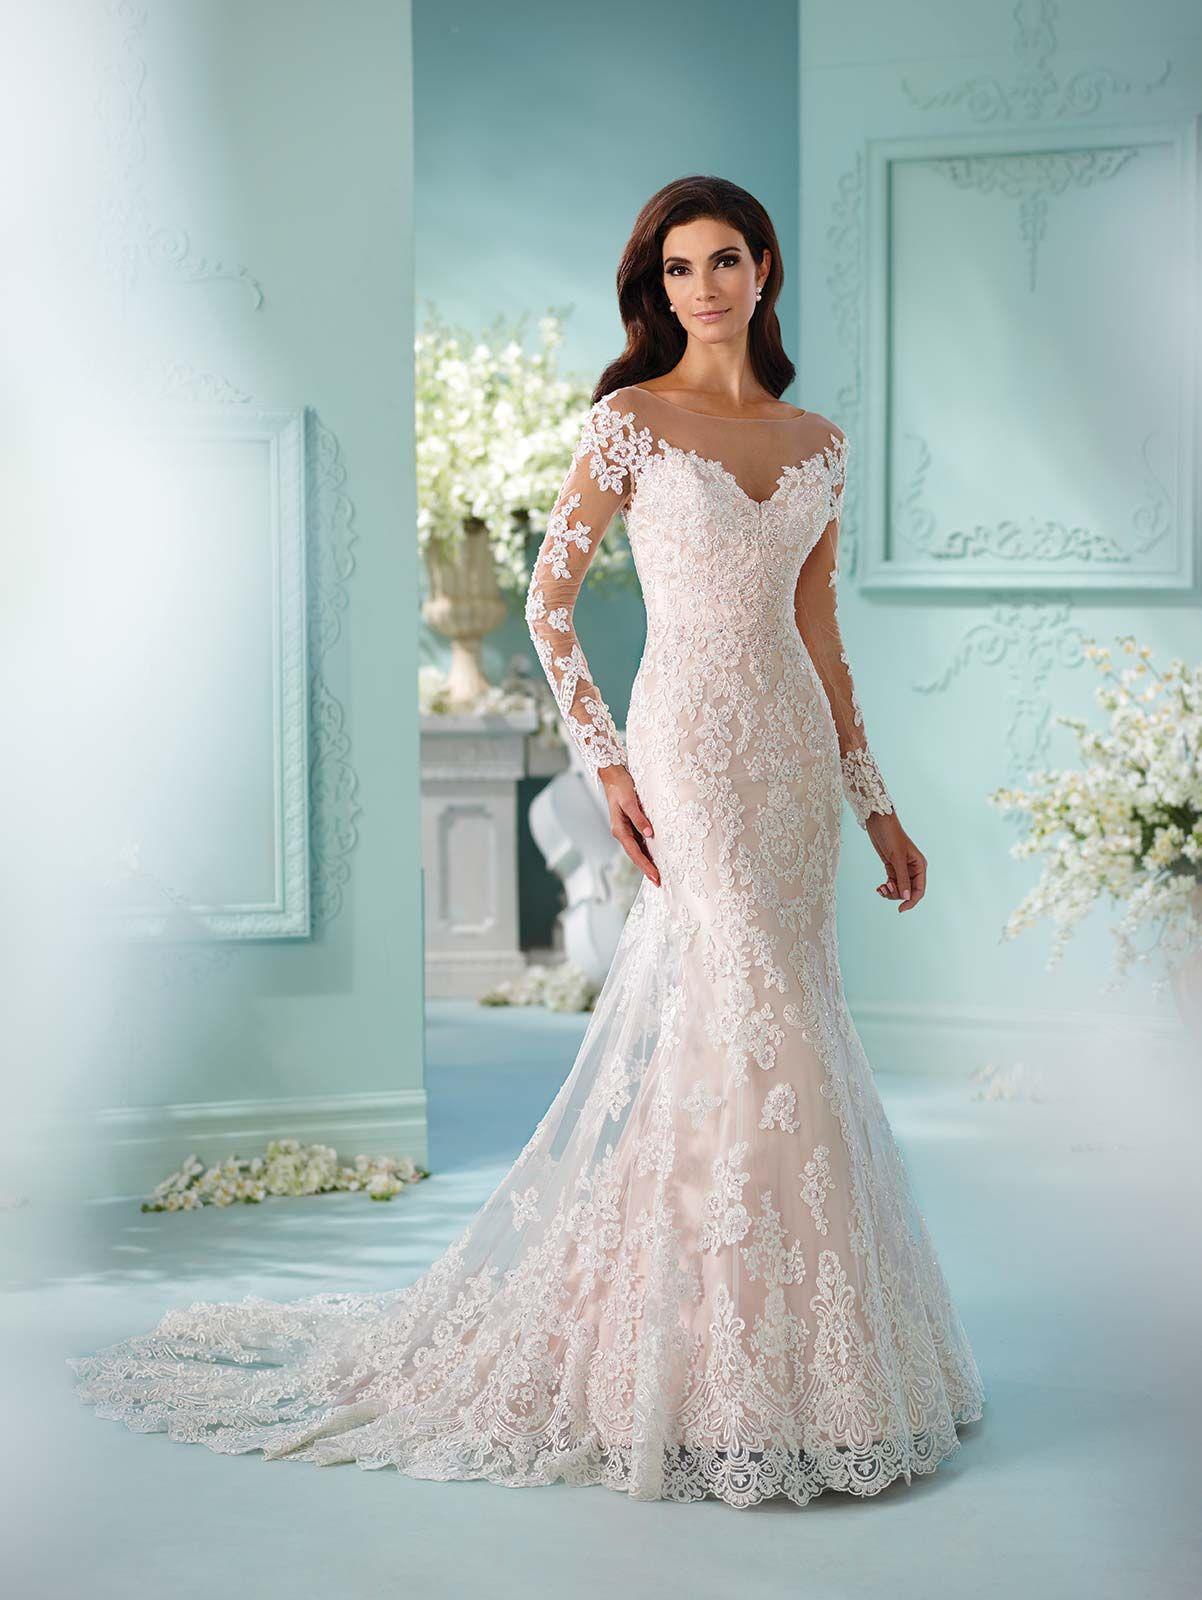 David tutera 216239 mon cheri bridals wedding gowns for How much are mon cheri wedding dresses